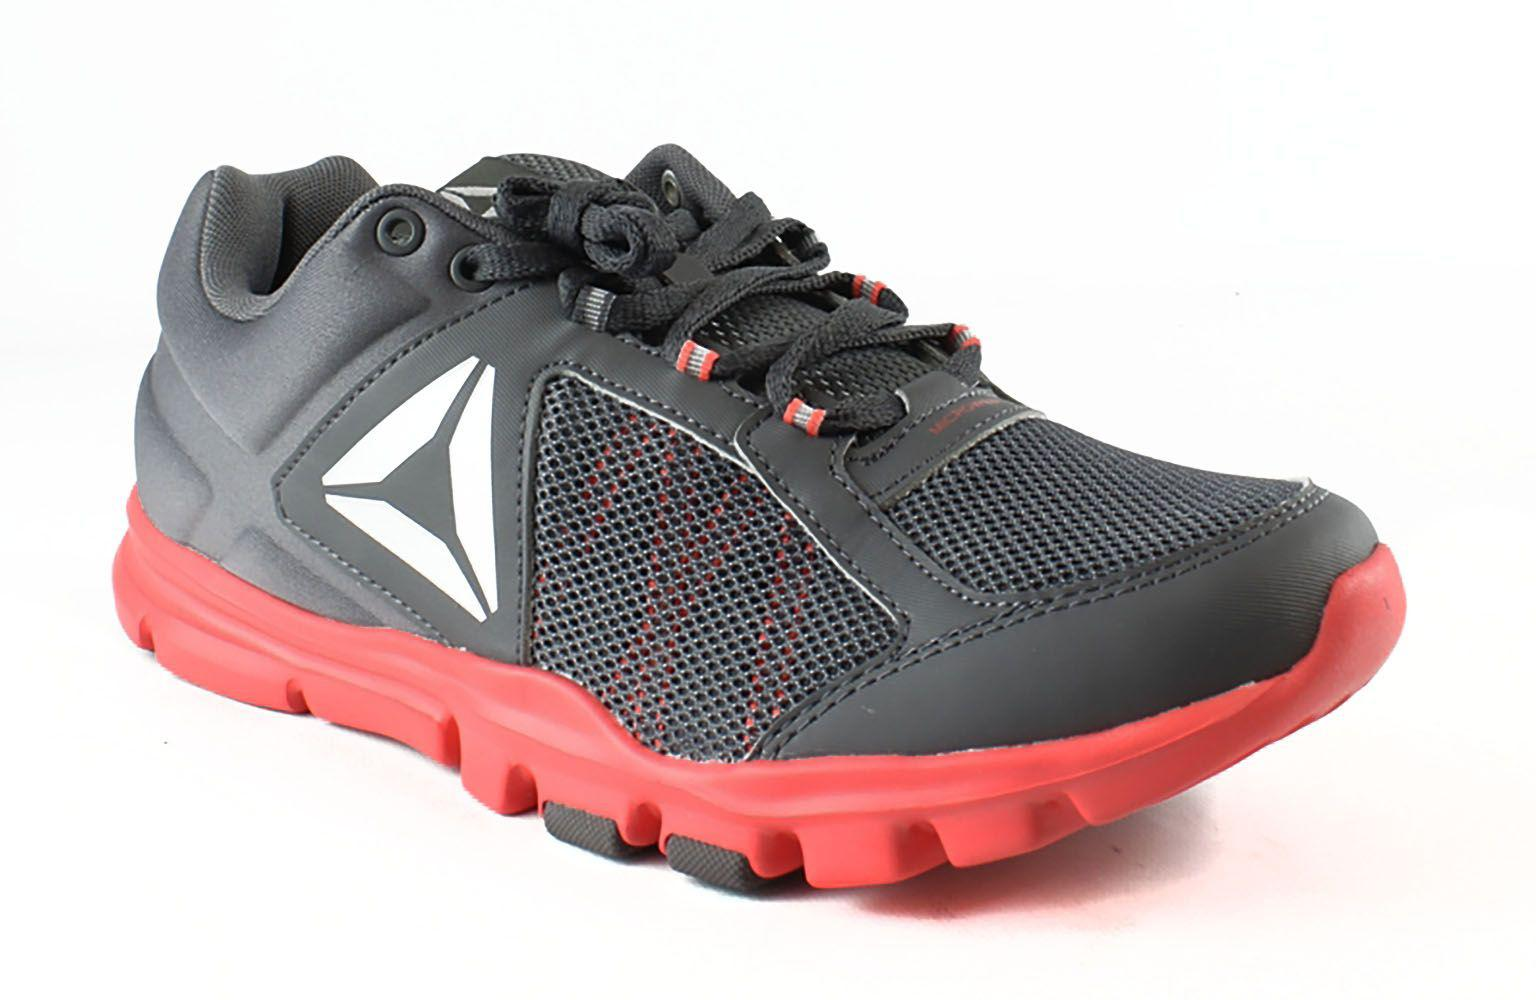 a3030e373156 Lyst - Reebok Womens Yourflex Trainette 9.0 Mt Gray Cross Training Shoes